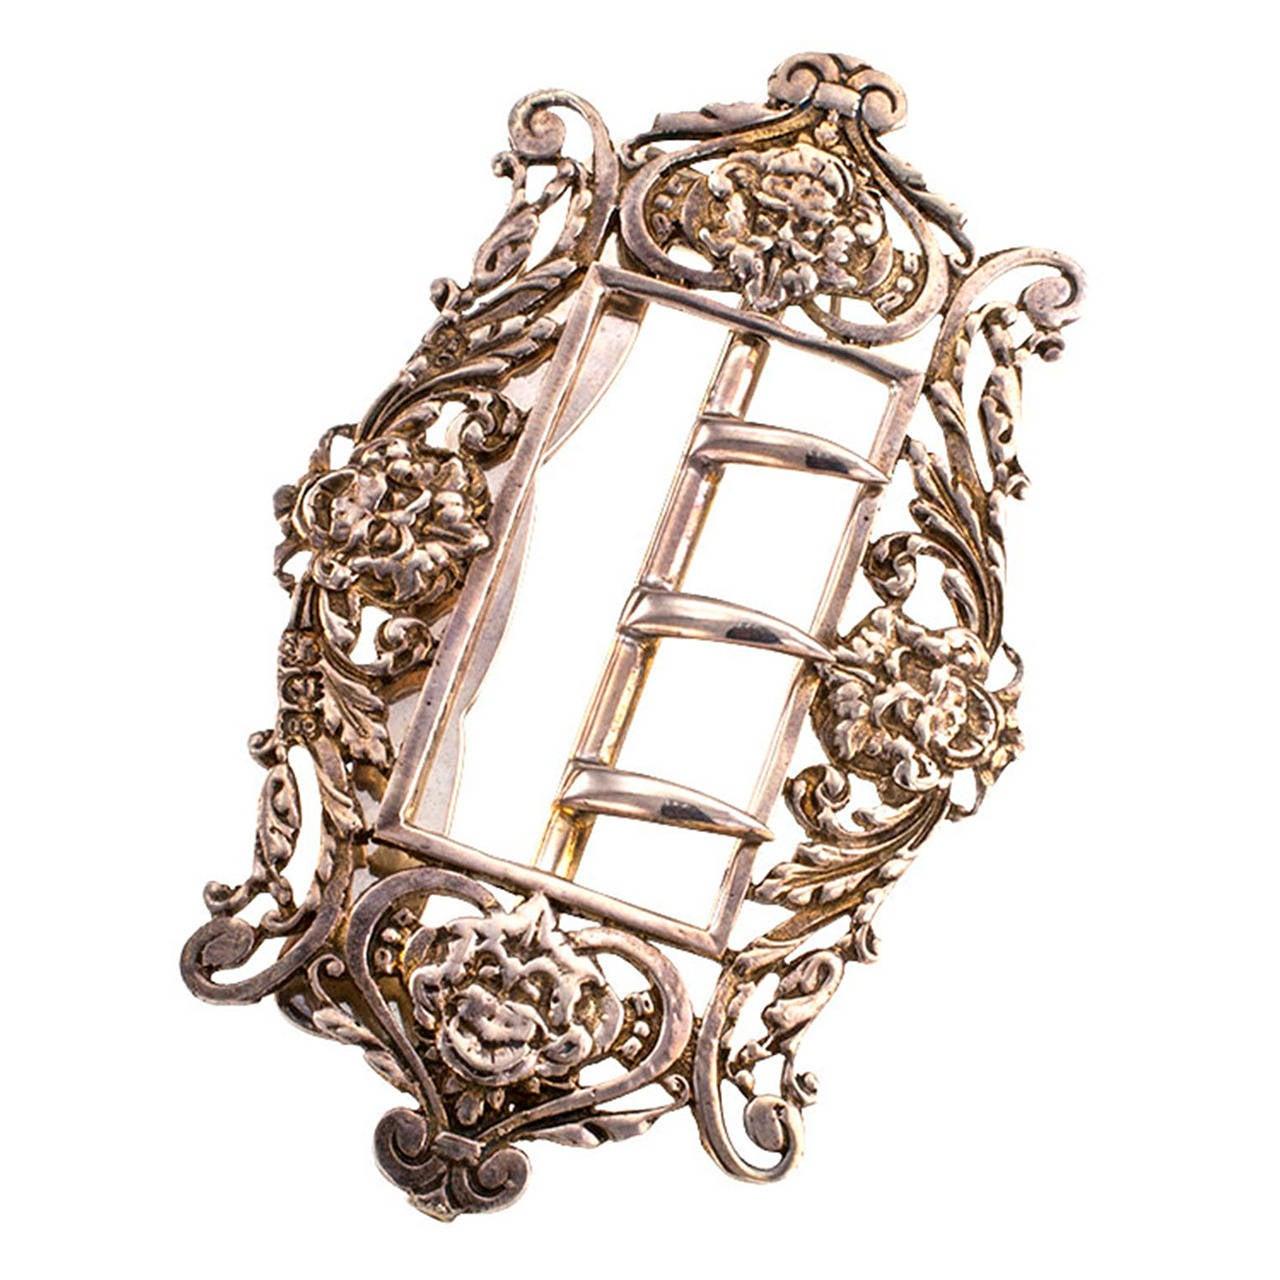 William Comyns Art Nouveau Sterling Silver Belt Buckle